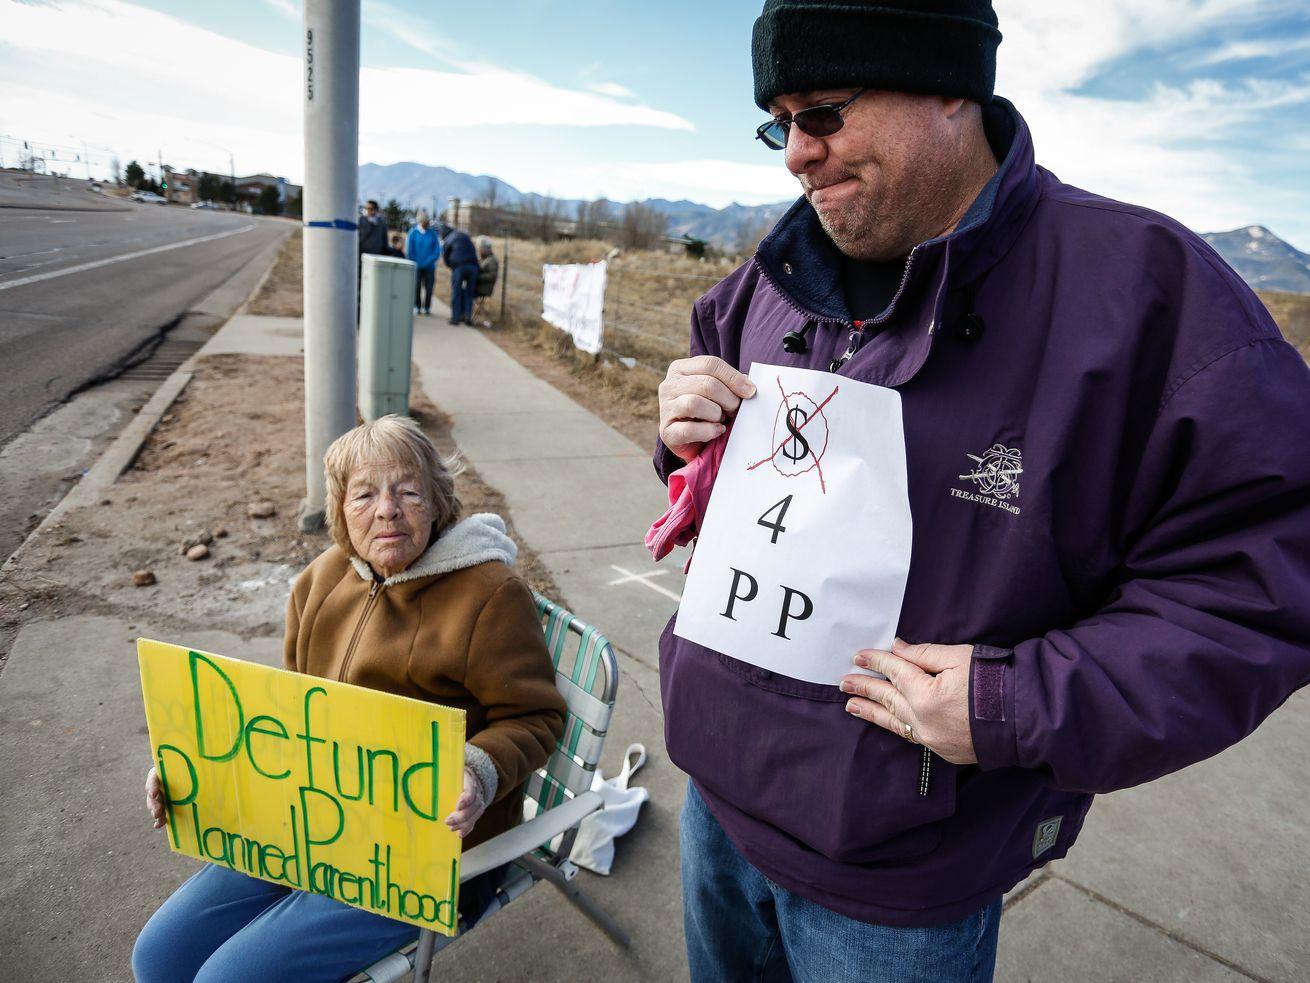 Protesters outside of the Colorado Springs Westside Health Center February 11, 2017, in Colorado Springs, Colorado.